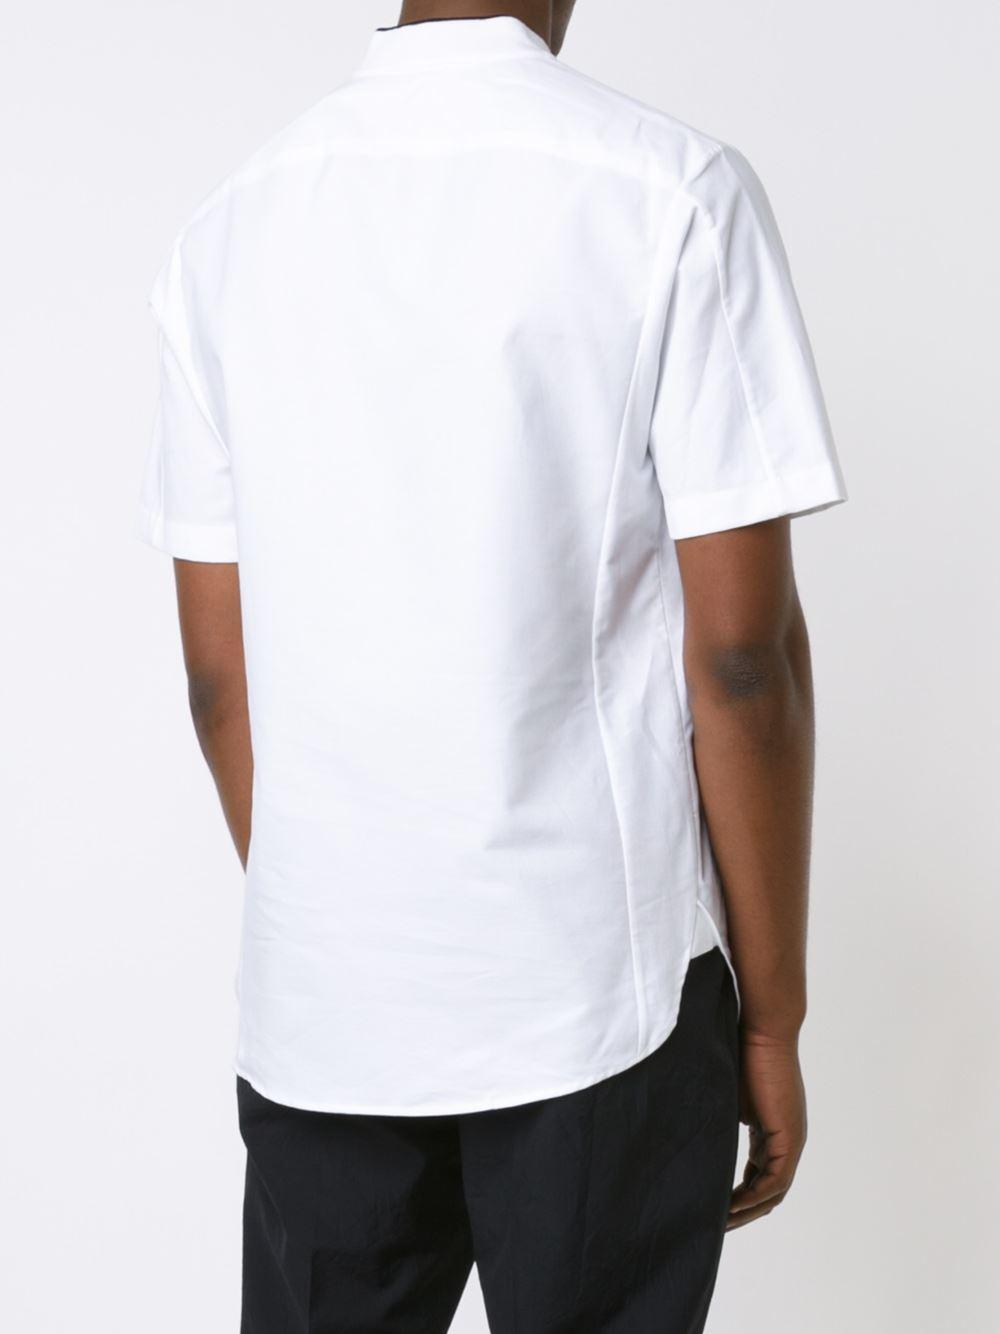 Lyst rag bone band collar shirt in black for men for Rag bone shirt